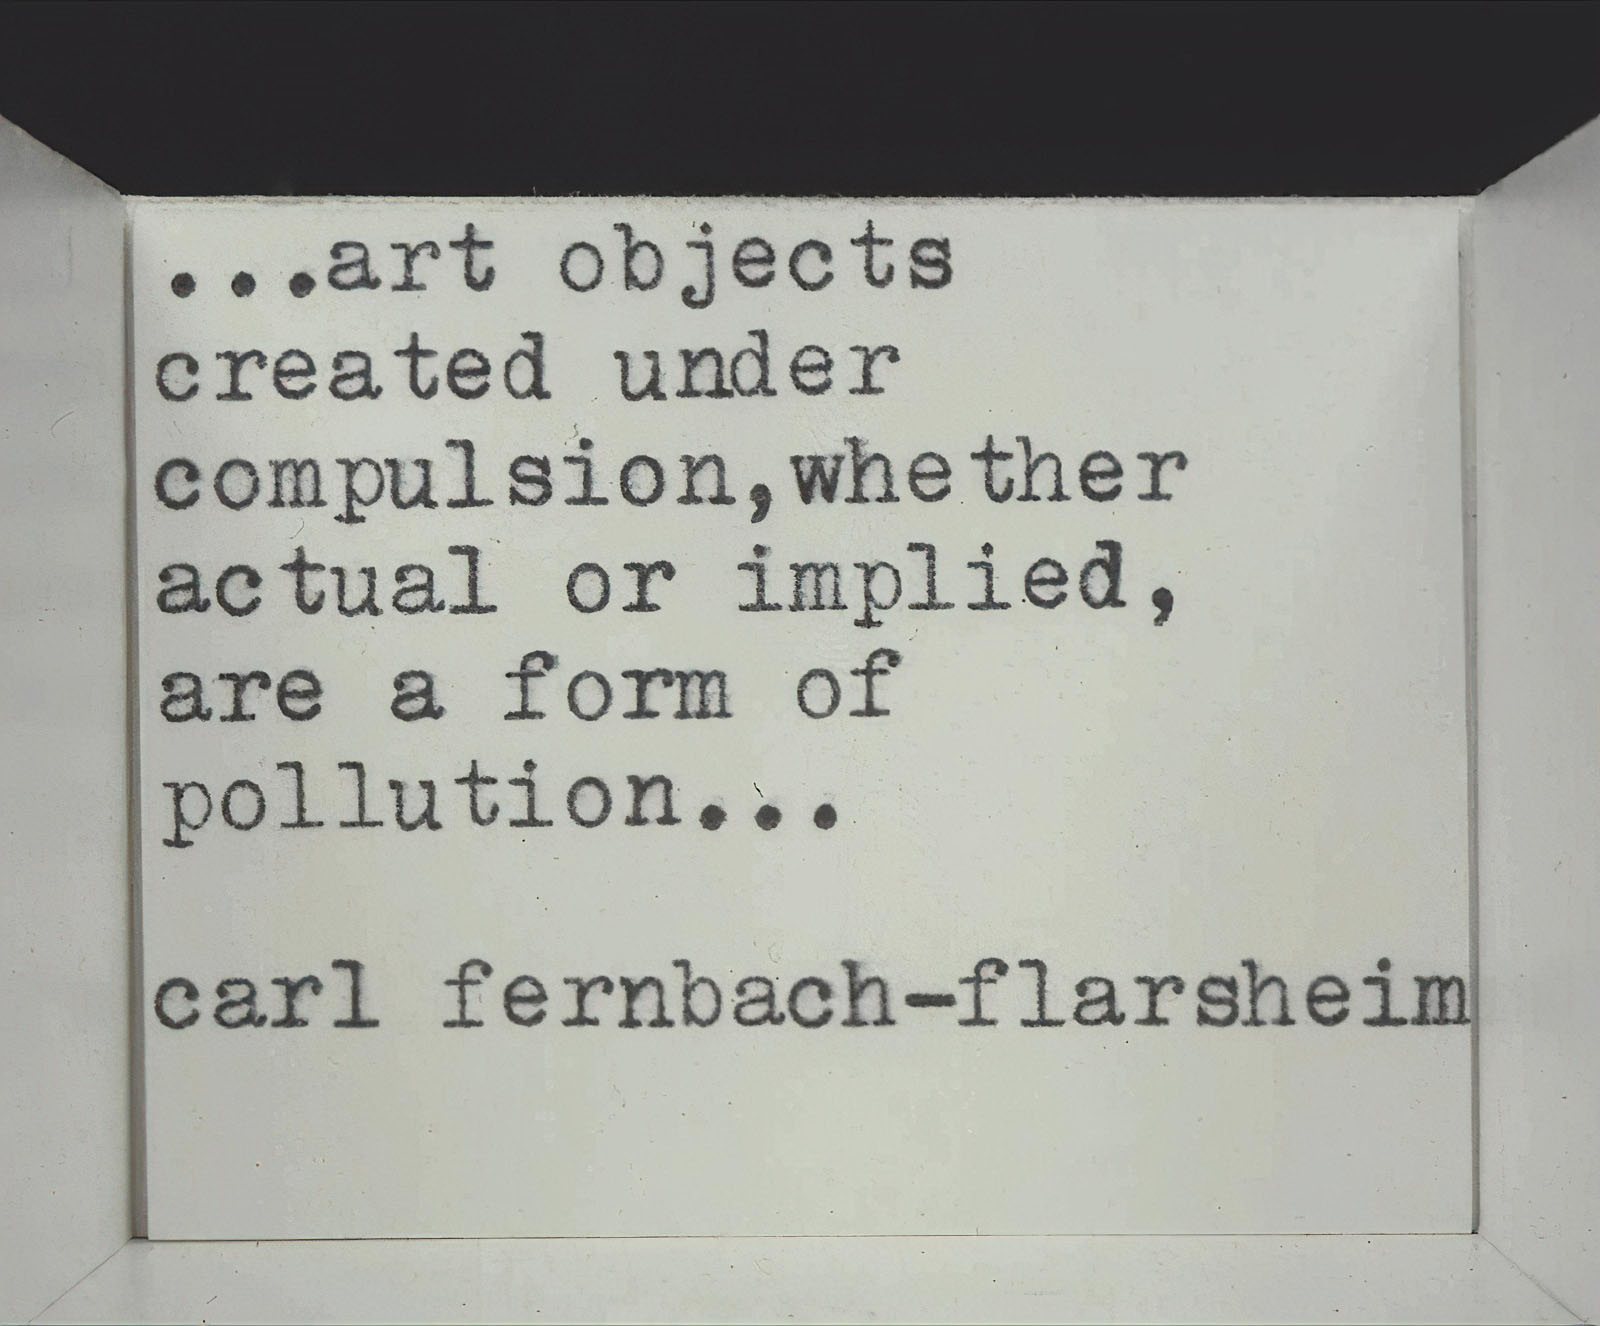 Carl Fernbach-Flarsheim - Statement